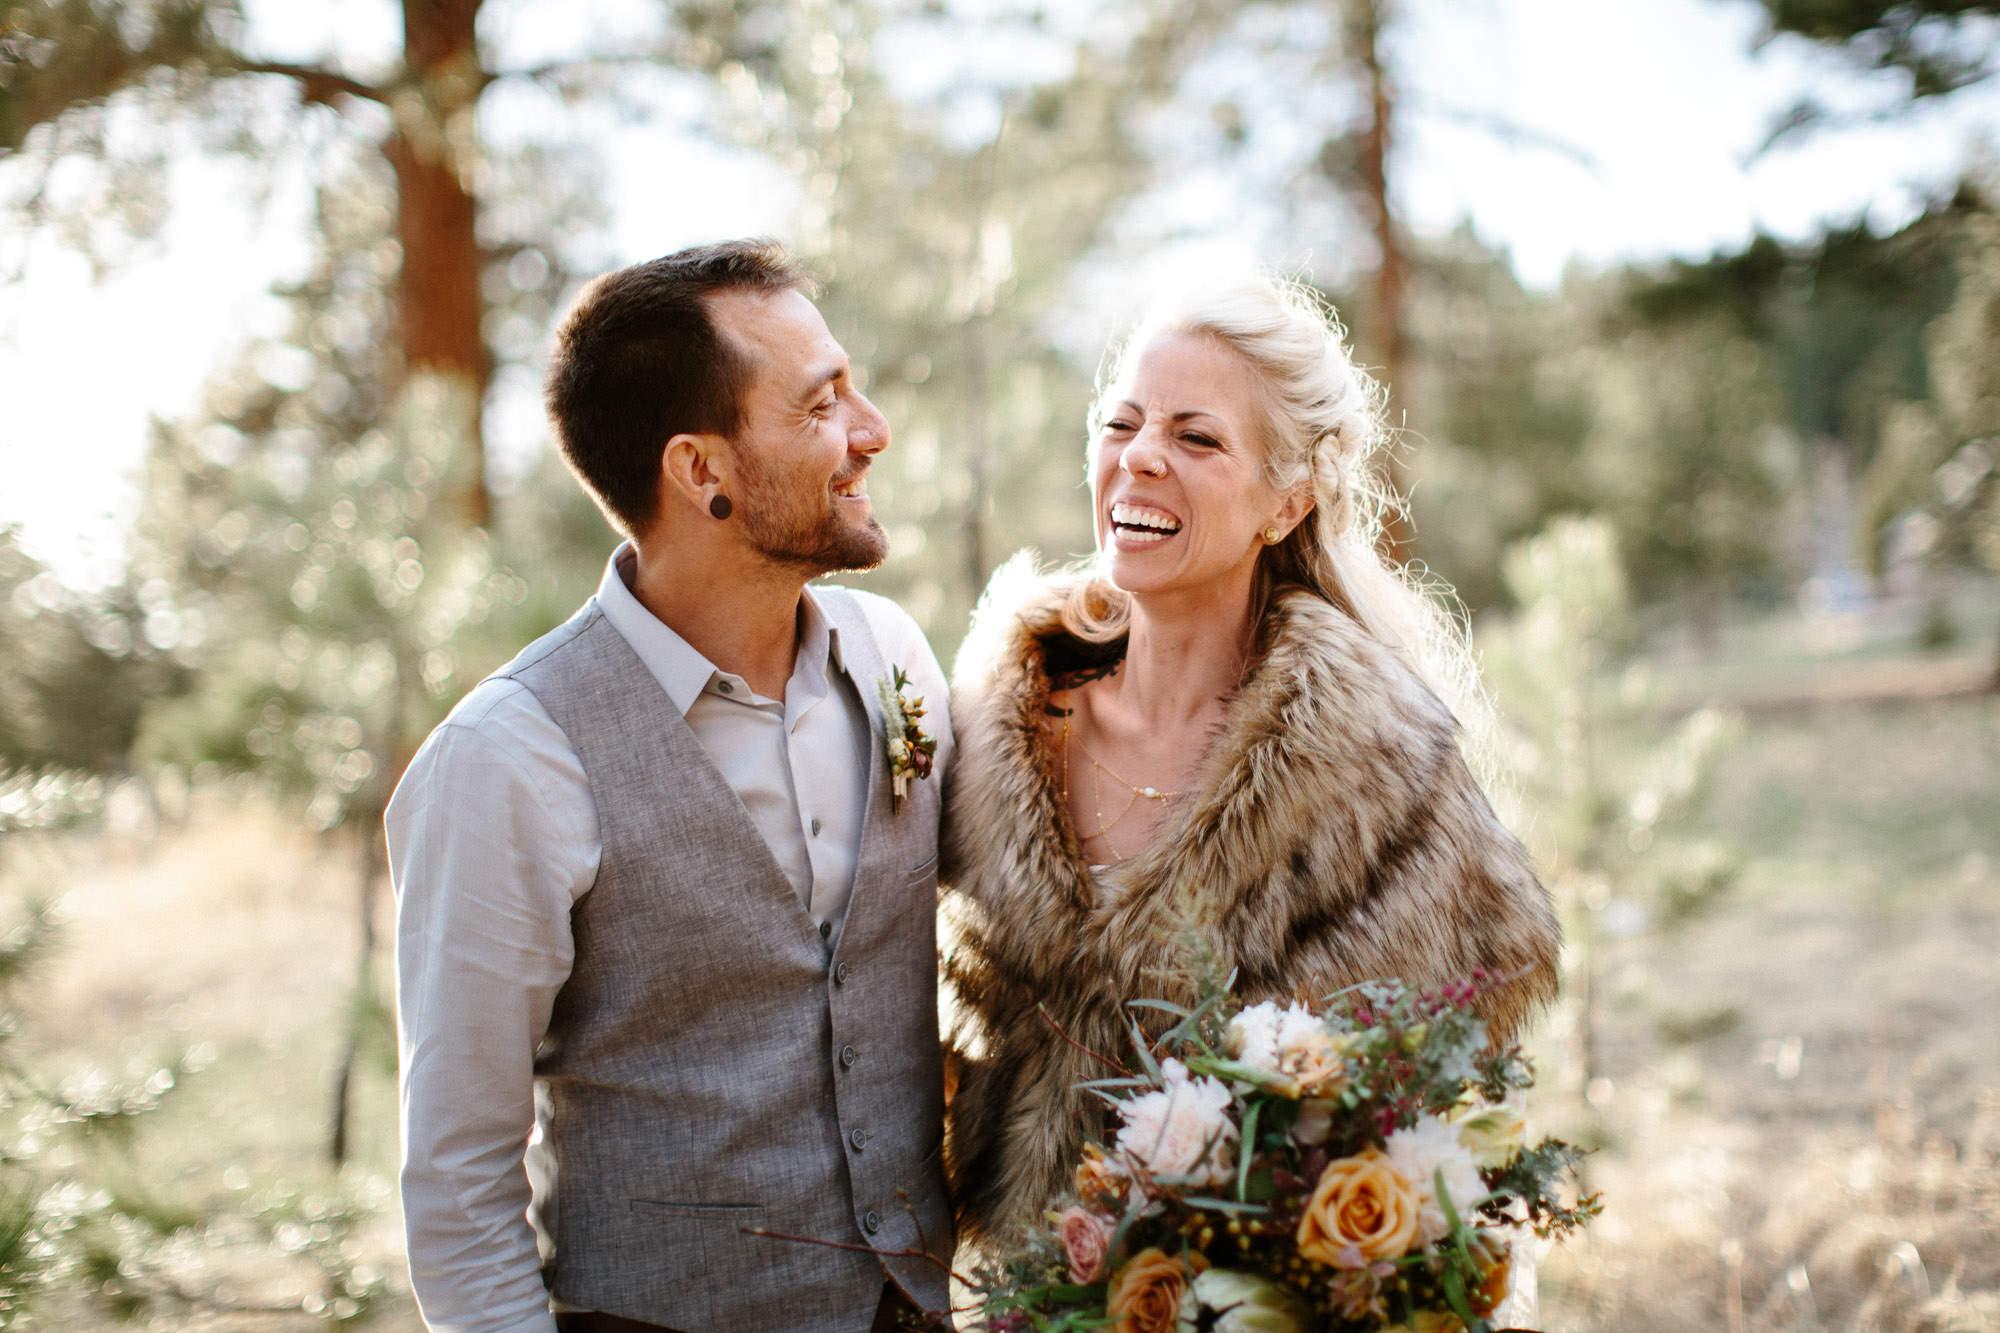 bucci-barn-wedding-elopement-evergreen-boulder-denver-colorado-adventerous-romantic-timeless-094.jpg